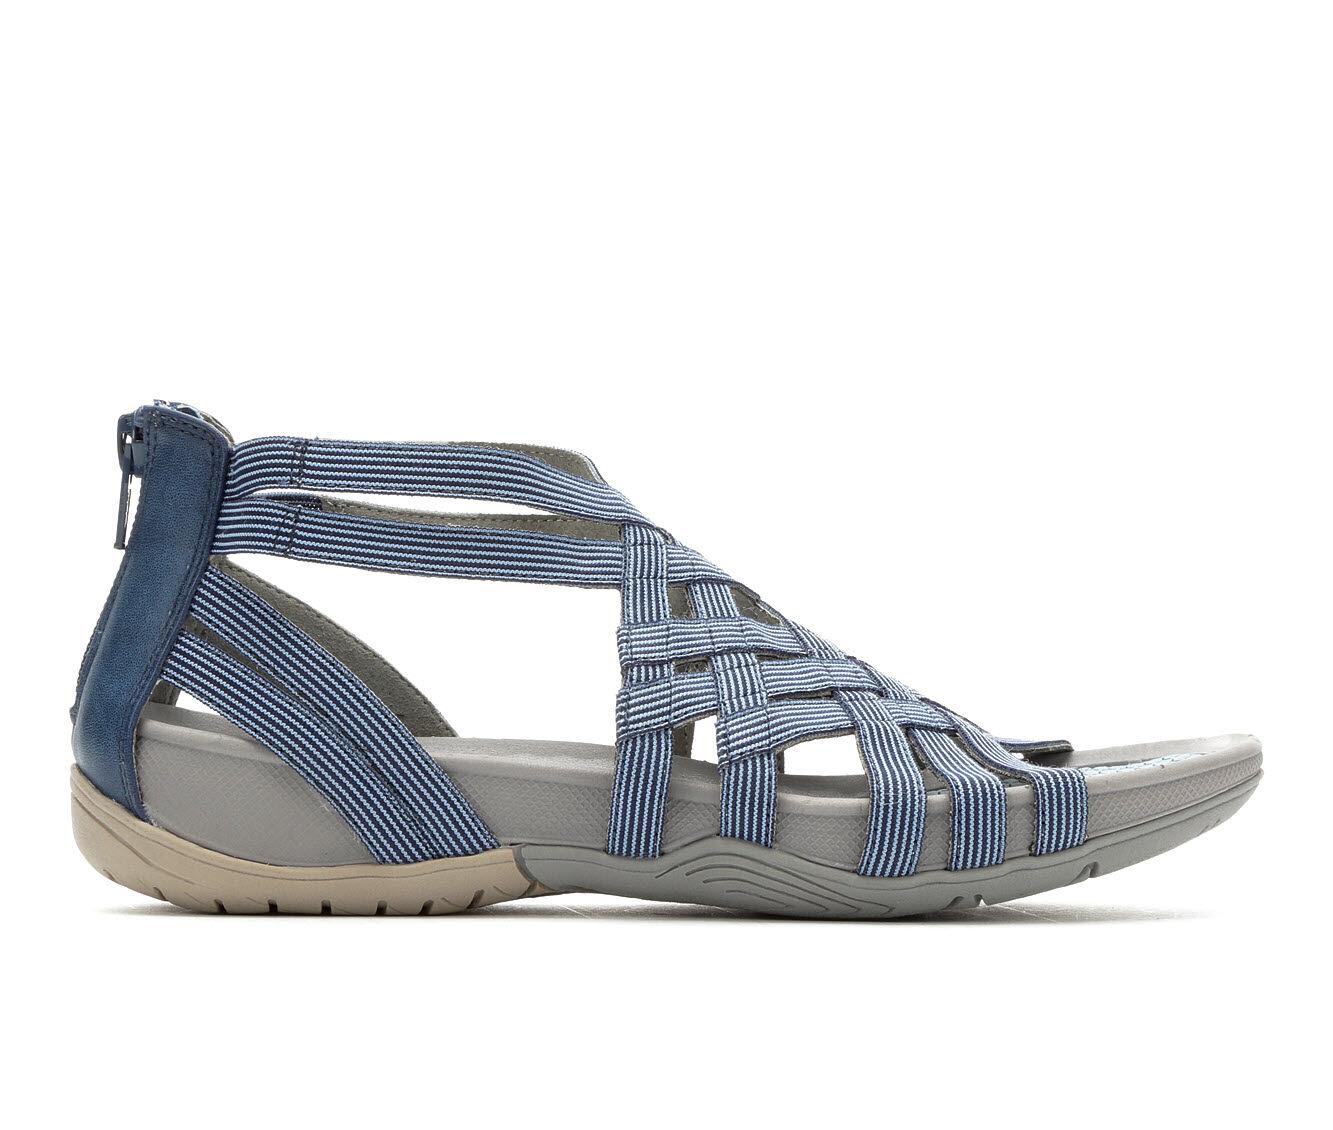 uk shoes_kd6597